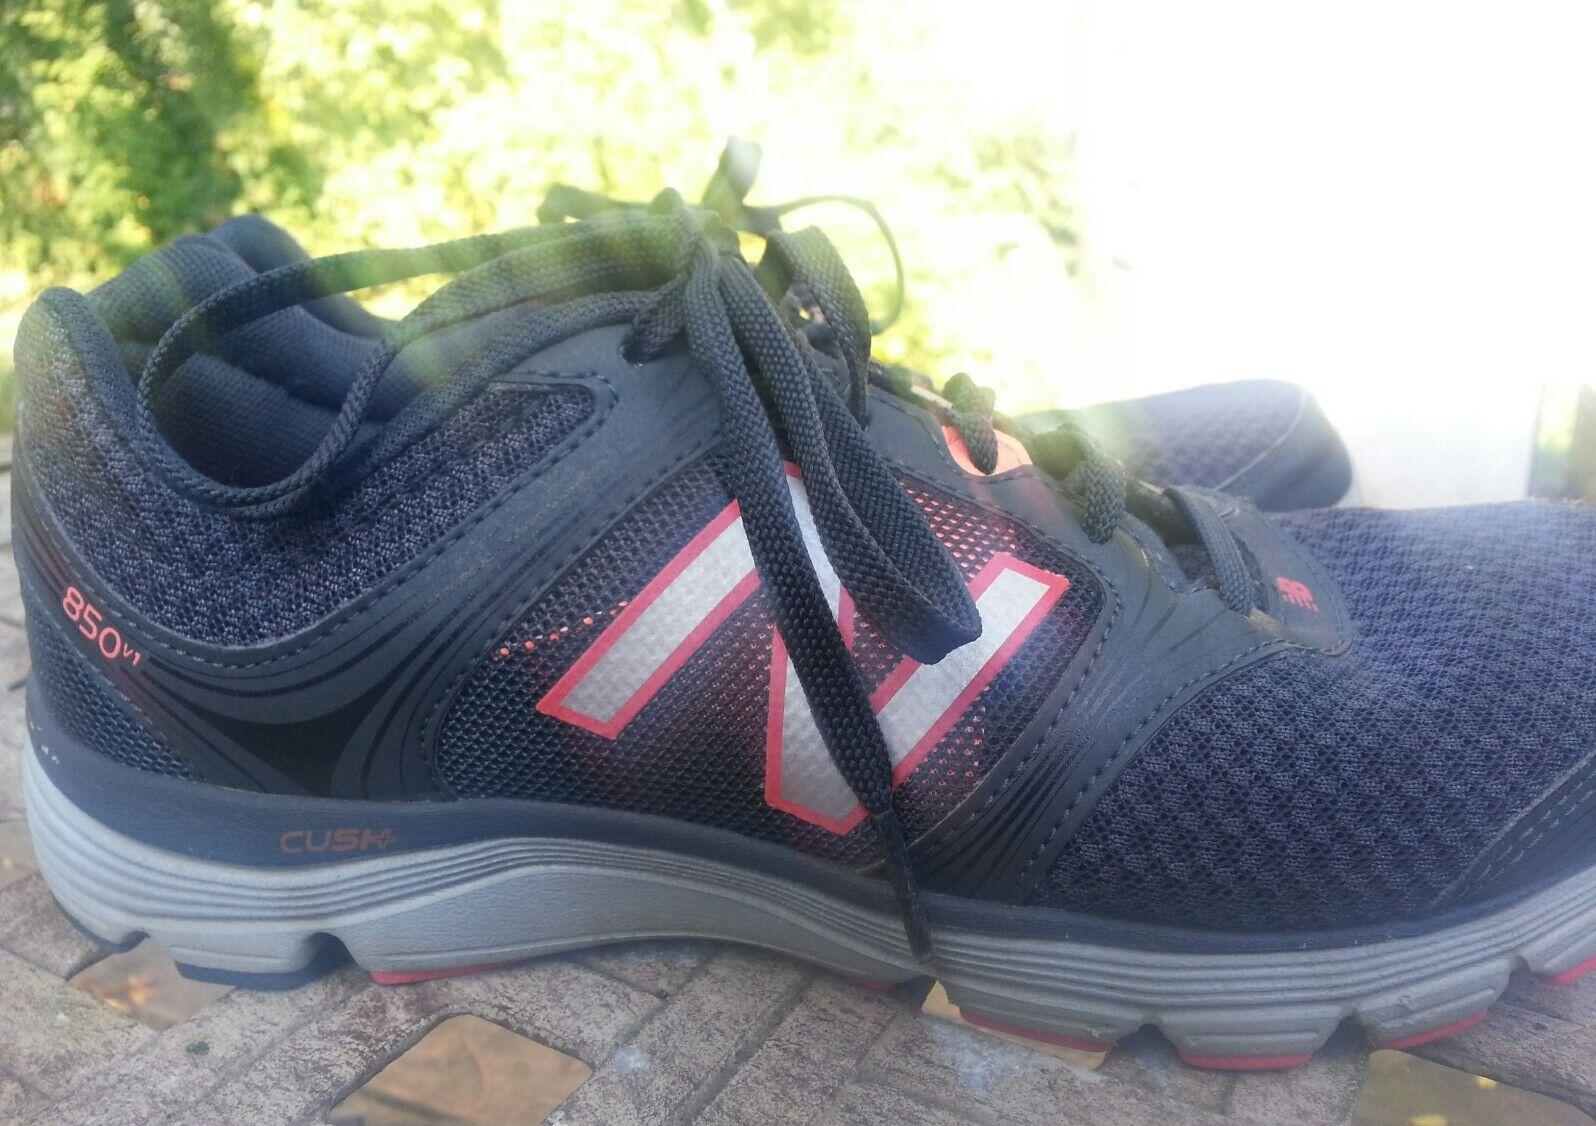 NEW BALANCE Womens 850v1 Running Shoes sz 8